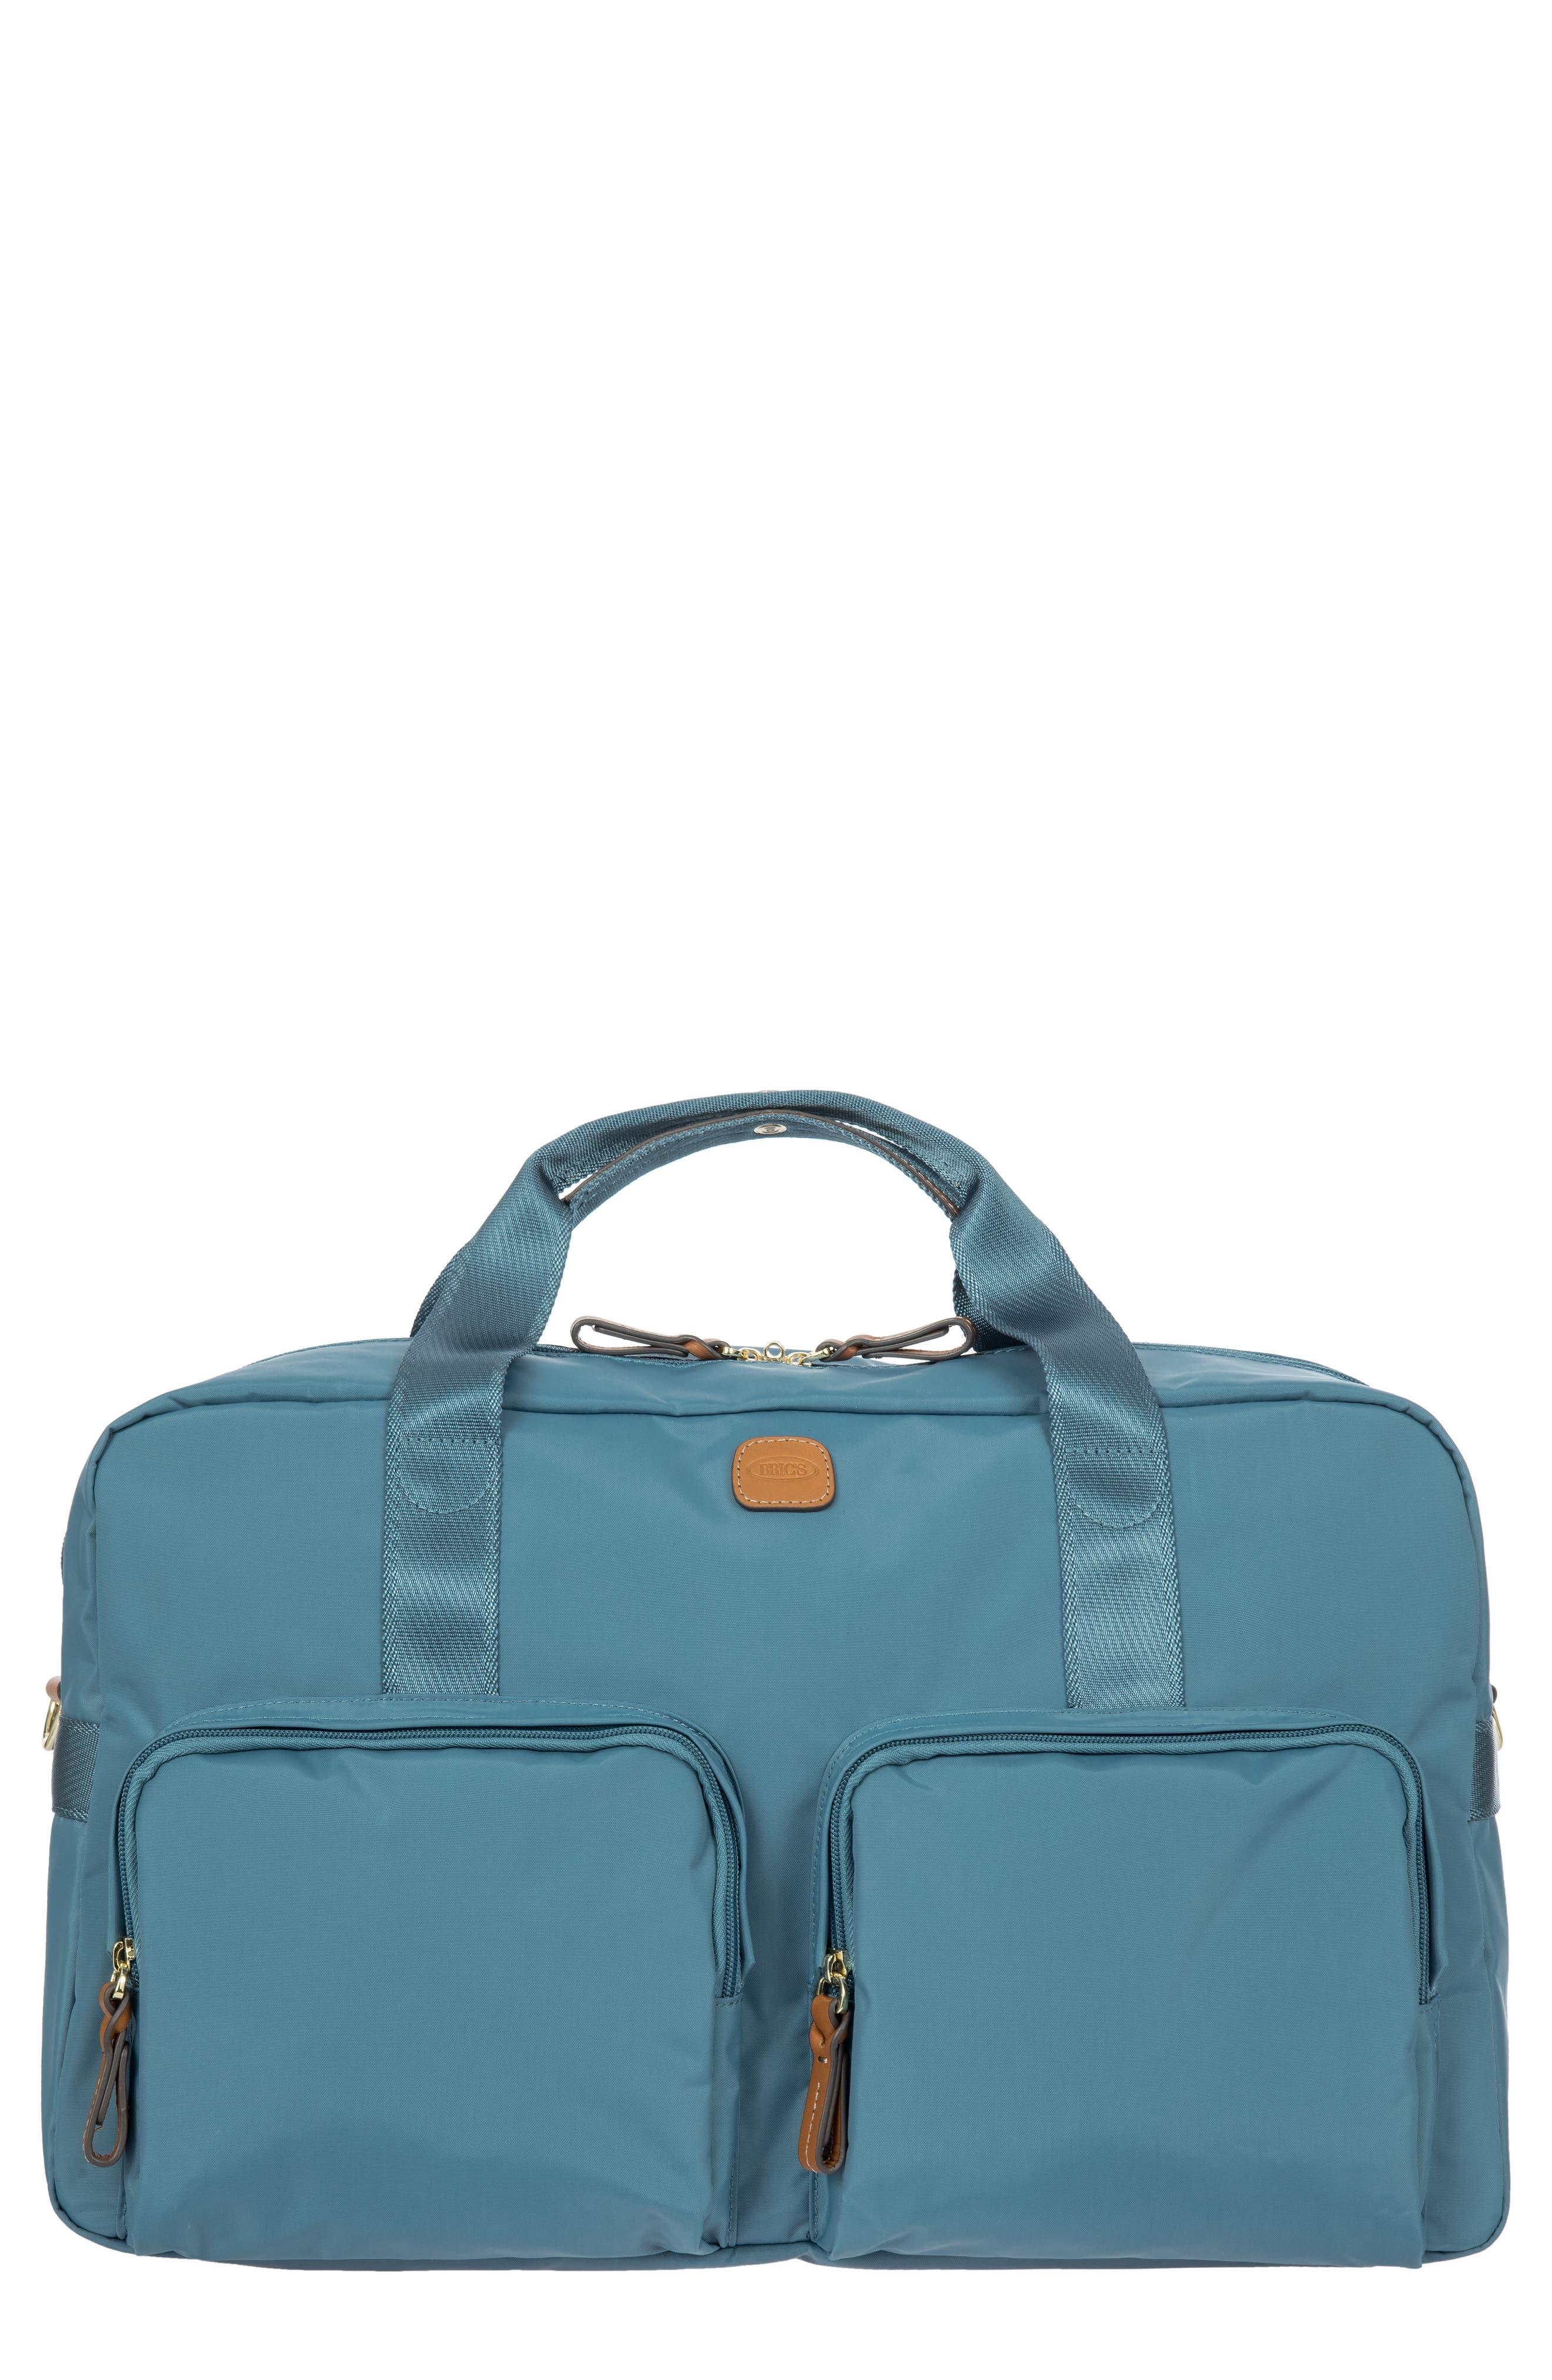 Bric's X-Bag 18-Inch Boarding Duffle Bag - Grey